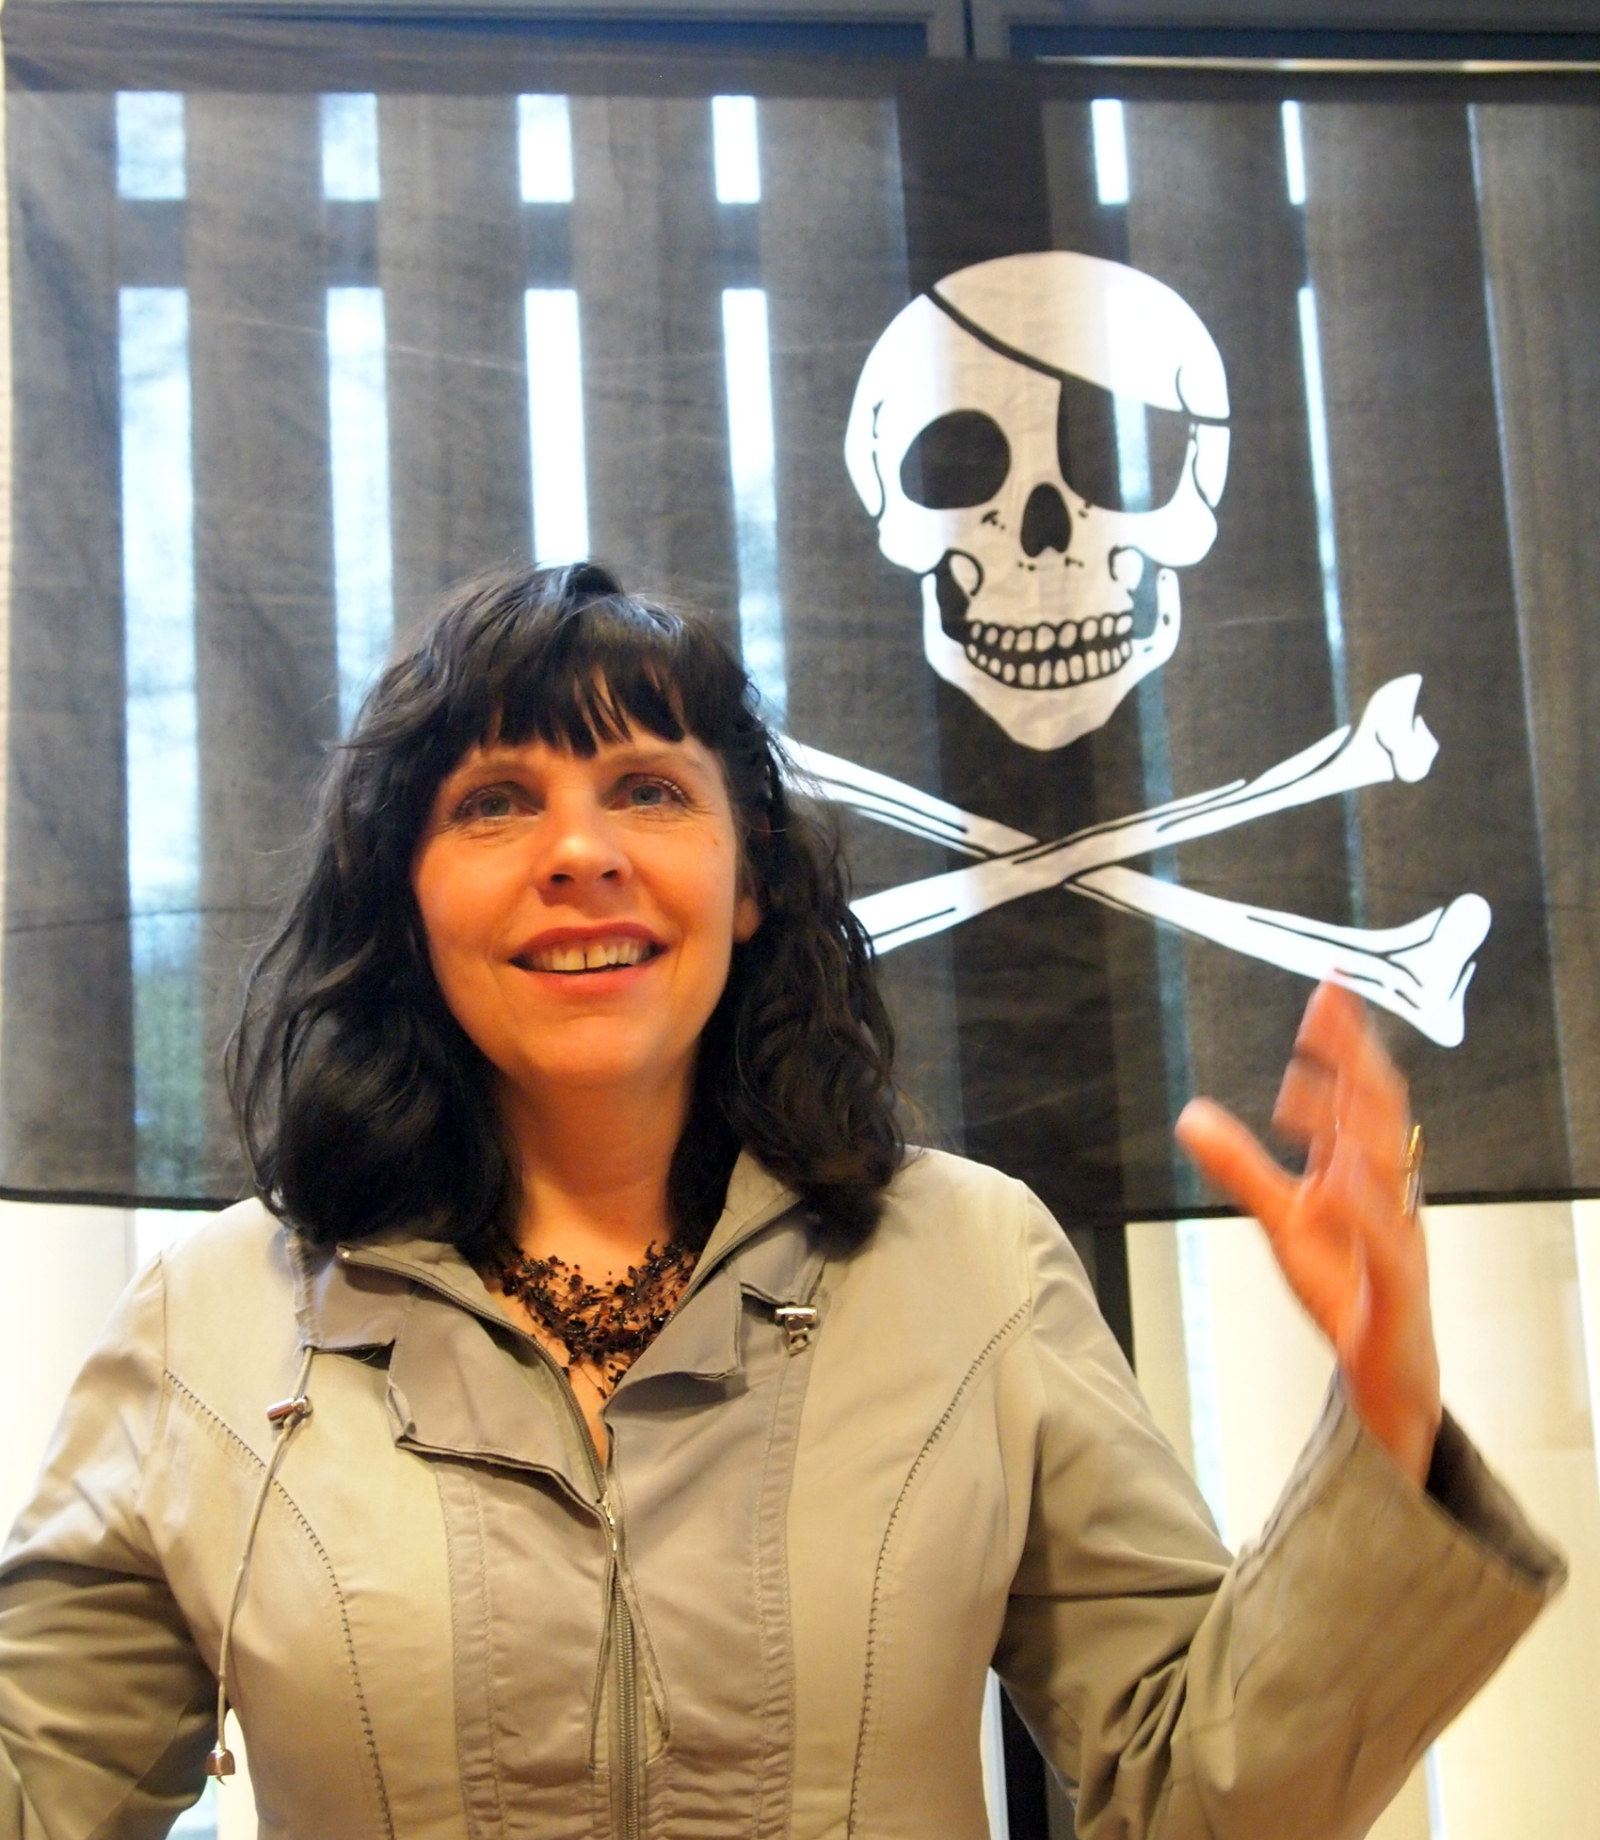 Birgitta Jónsdóttir pirate party